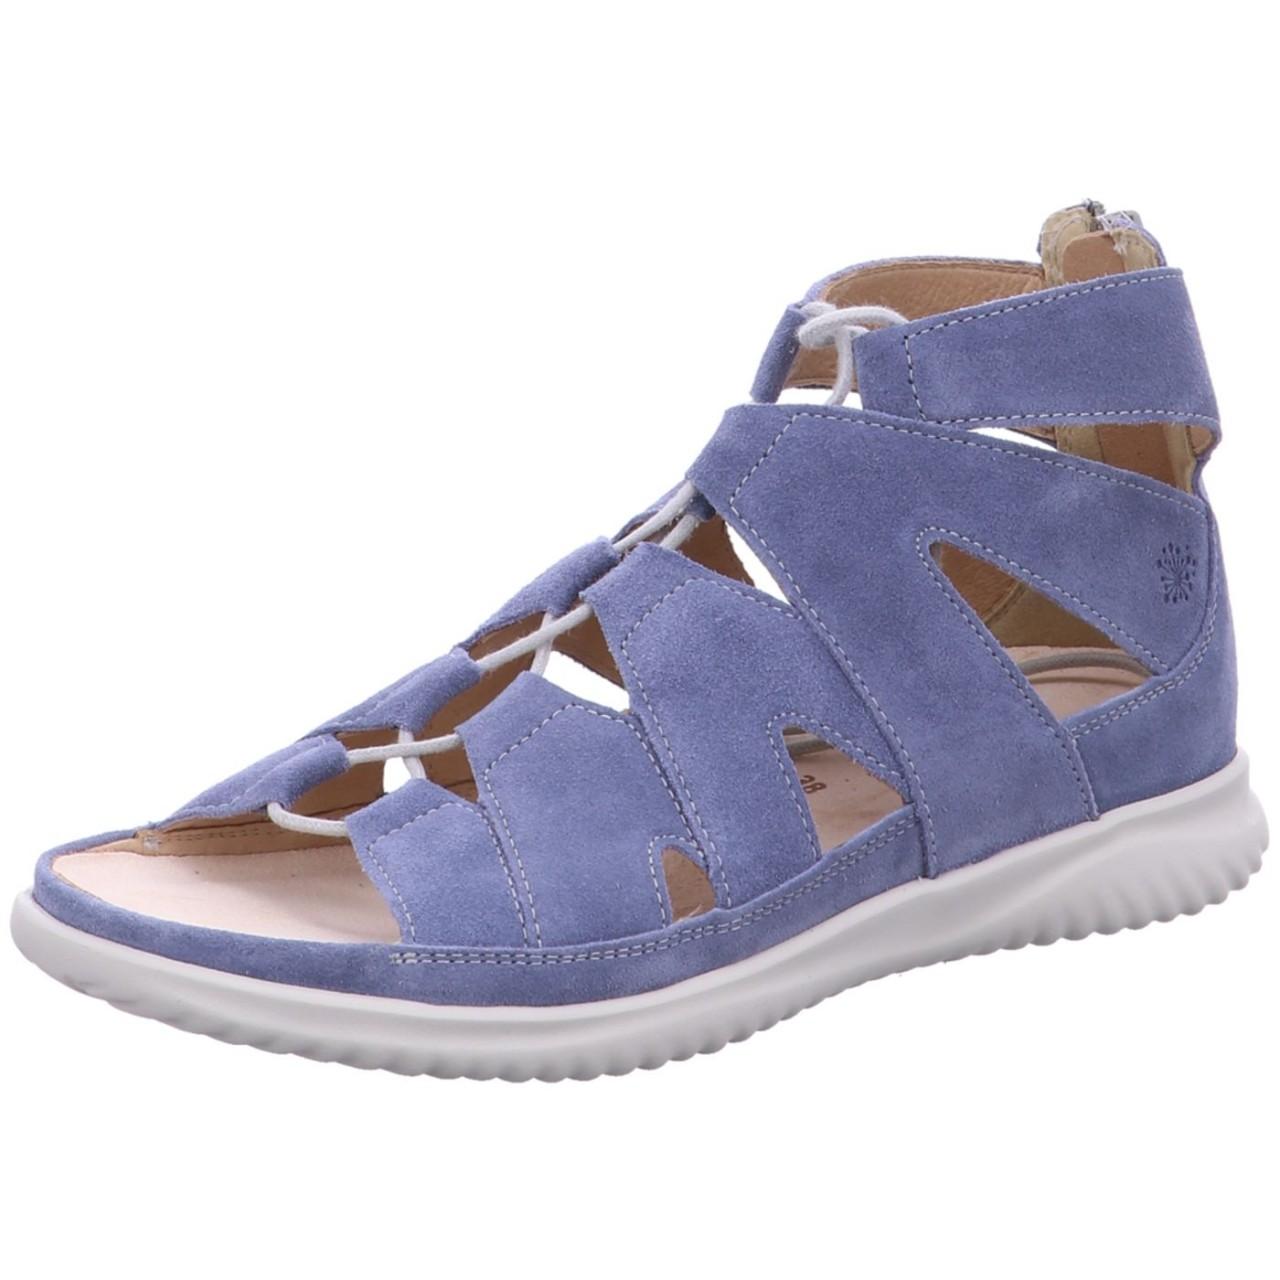 Hartjes Sandale Breeze 2 Blau 112432 42